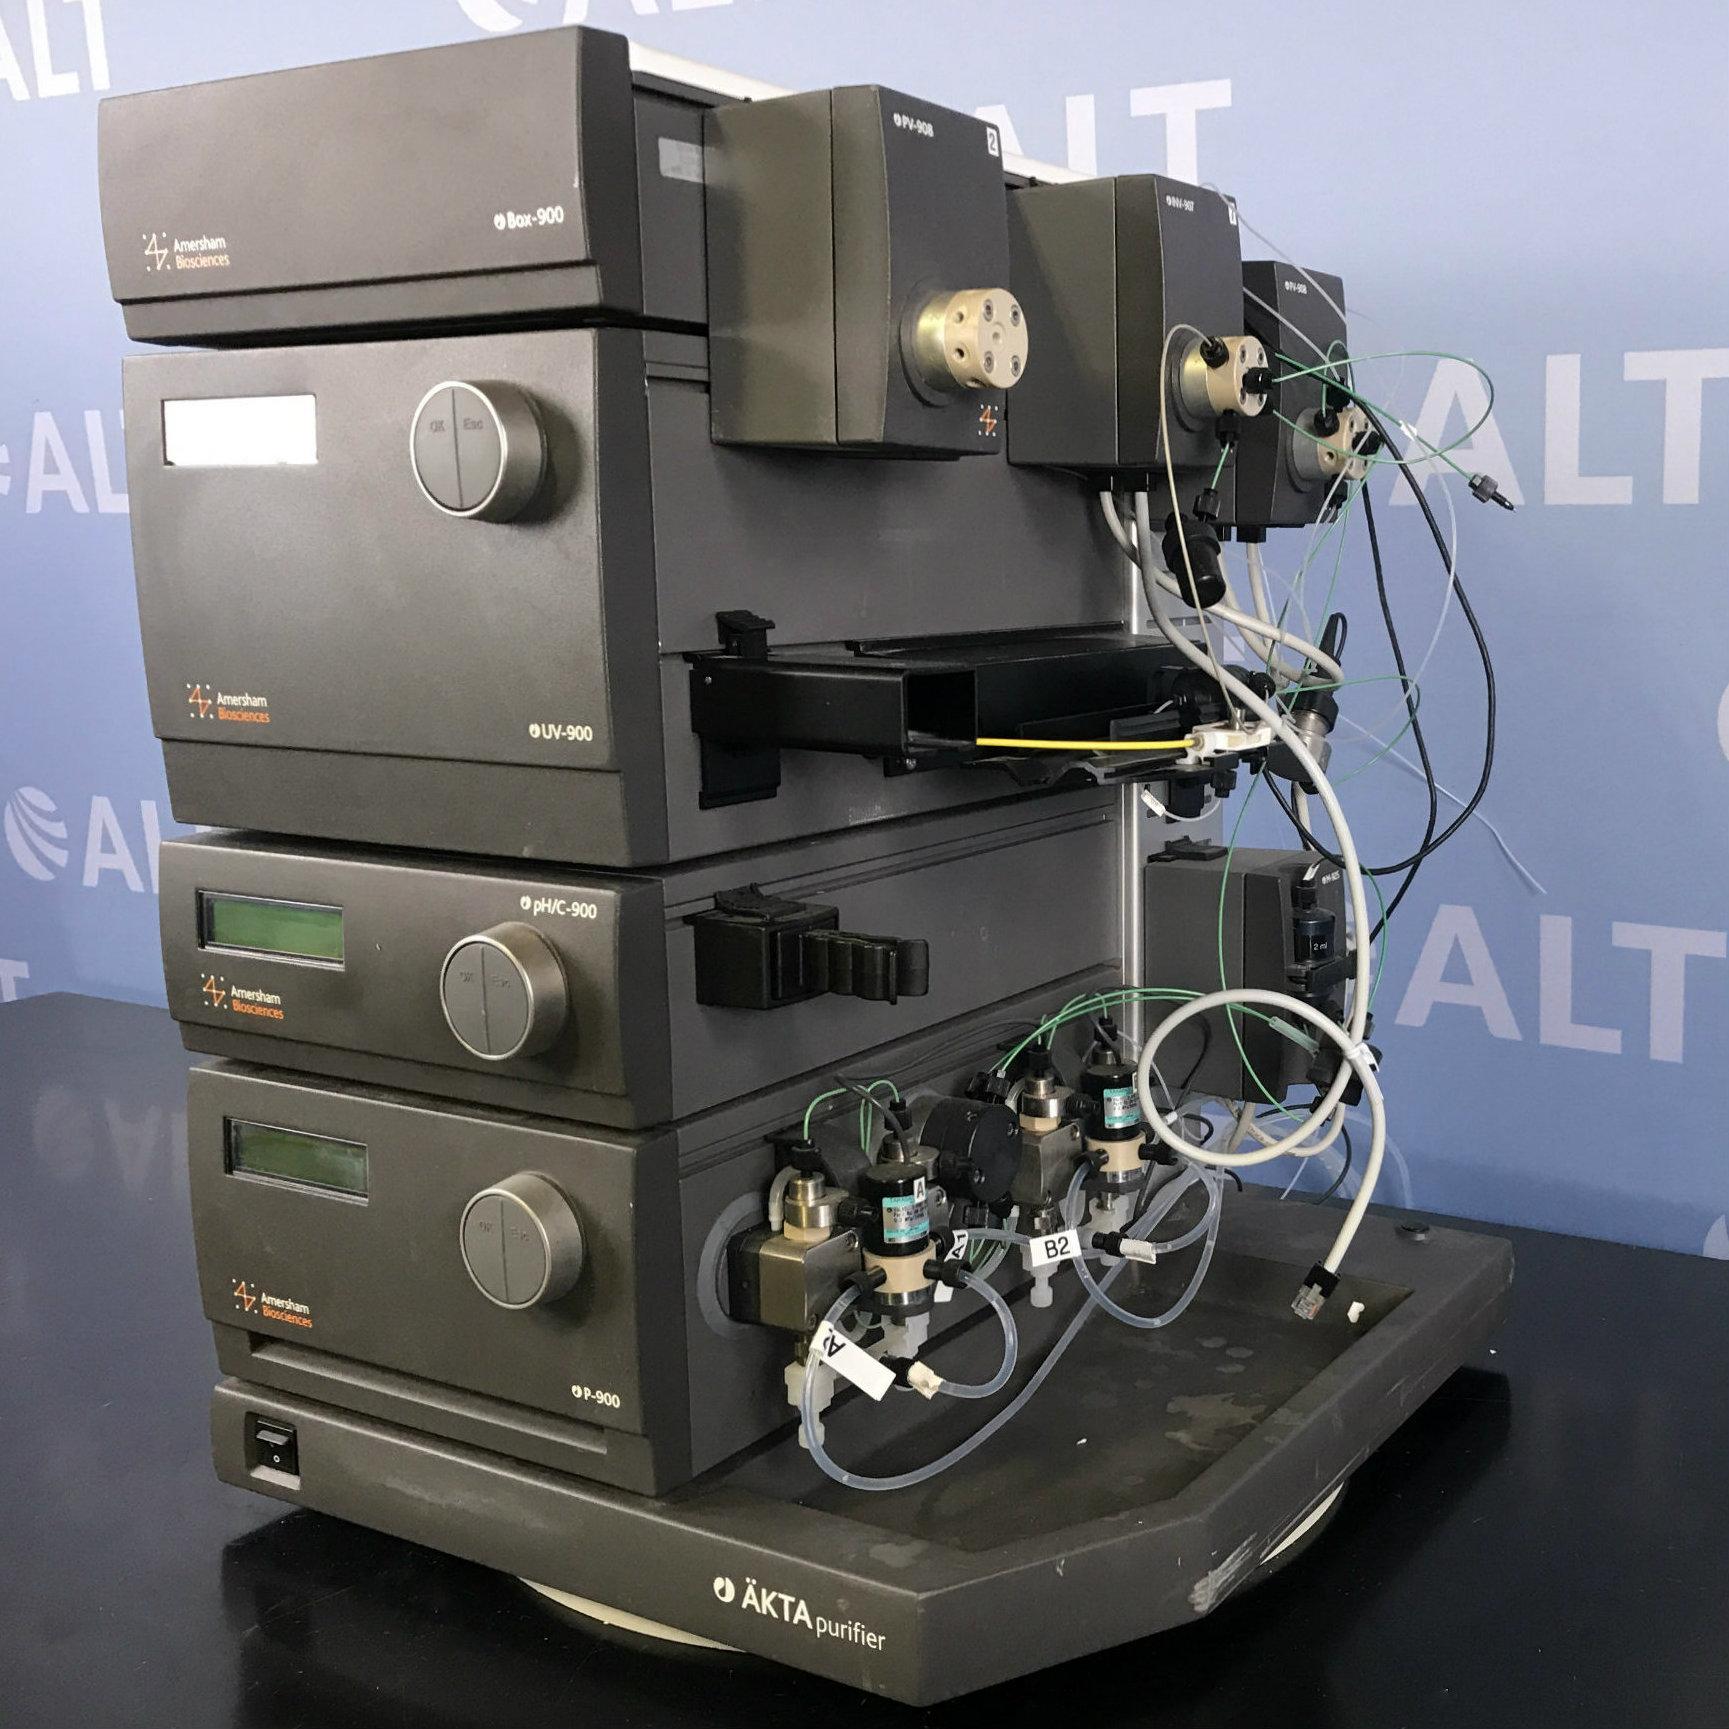 Amersham Biosciences AKTA Purifier 100 FPLC System Image